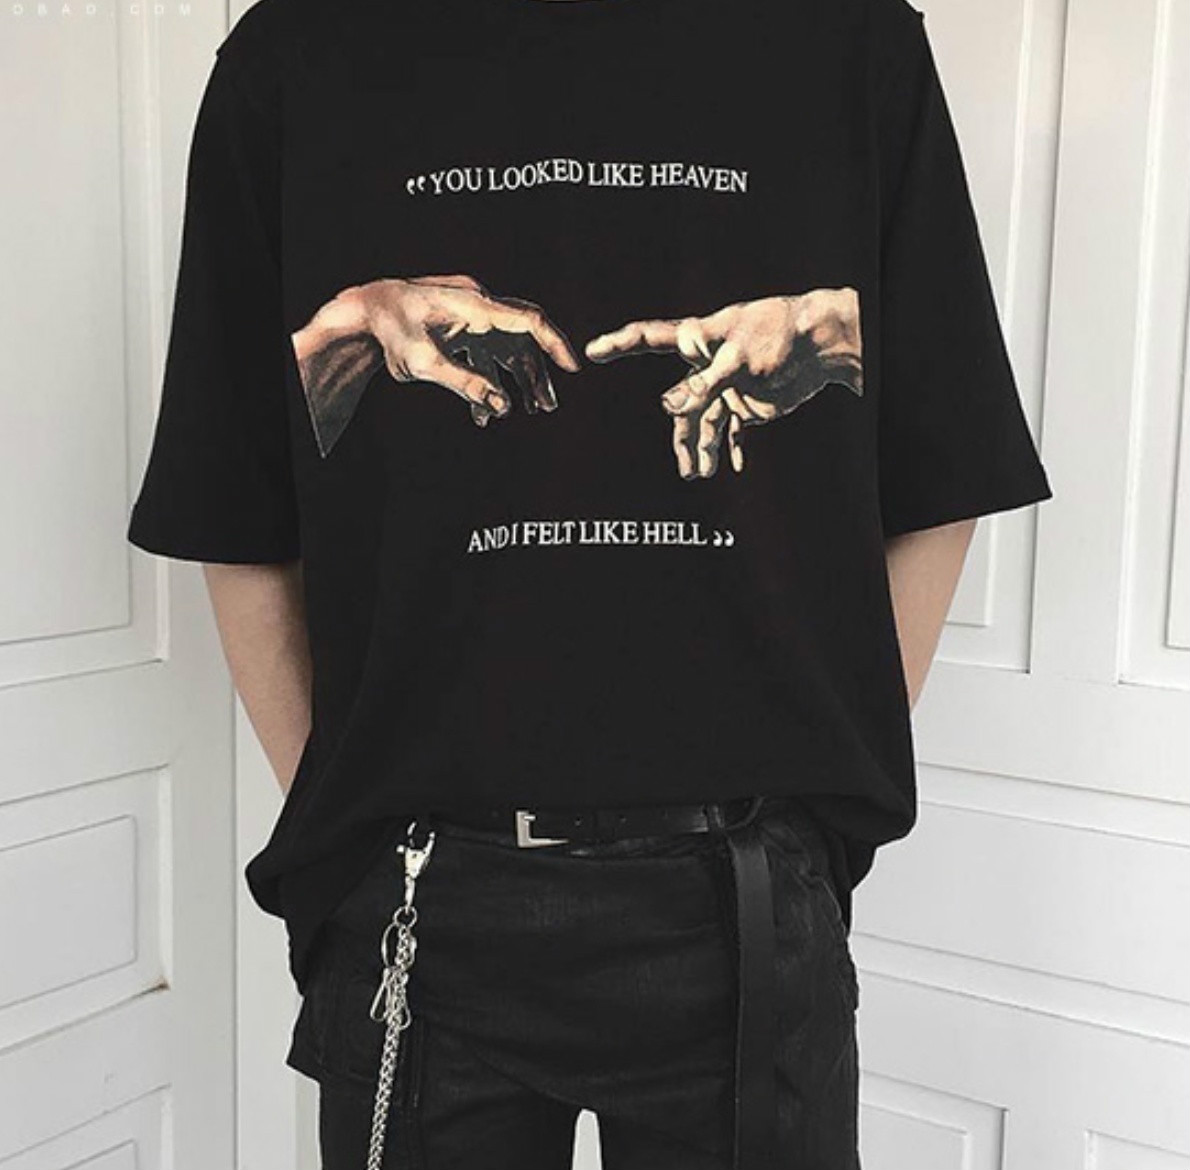 Fashionshow-JF Summer Man Tee You Looked Like Heaven And I Felt Like Hell Michaelangelo Creation Of Adam Hands Printing T Shirt